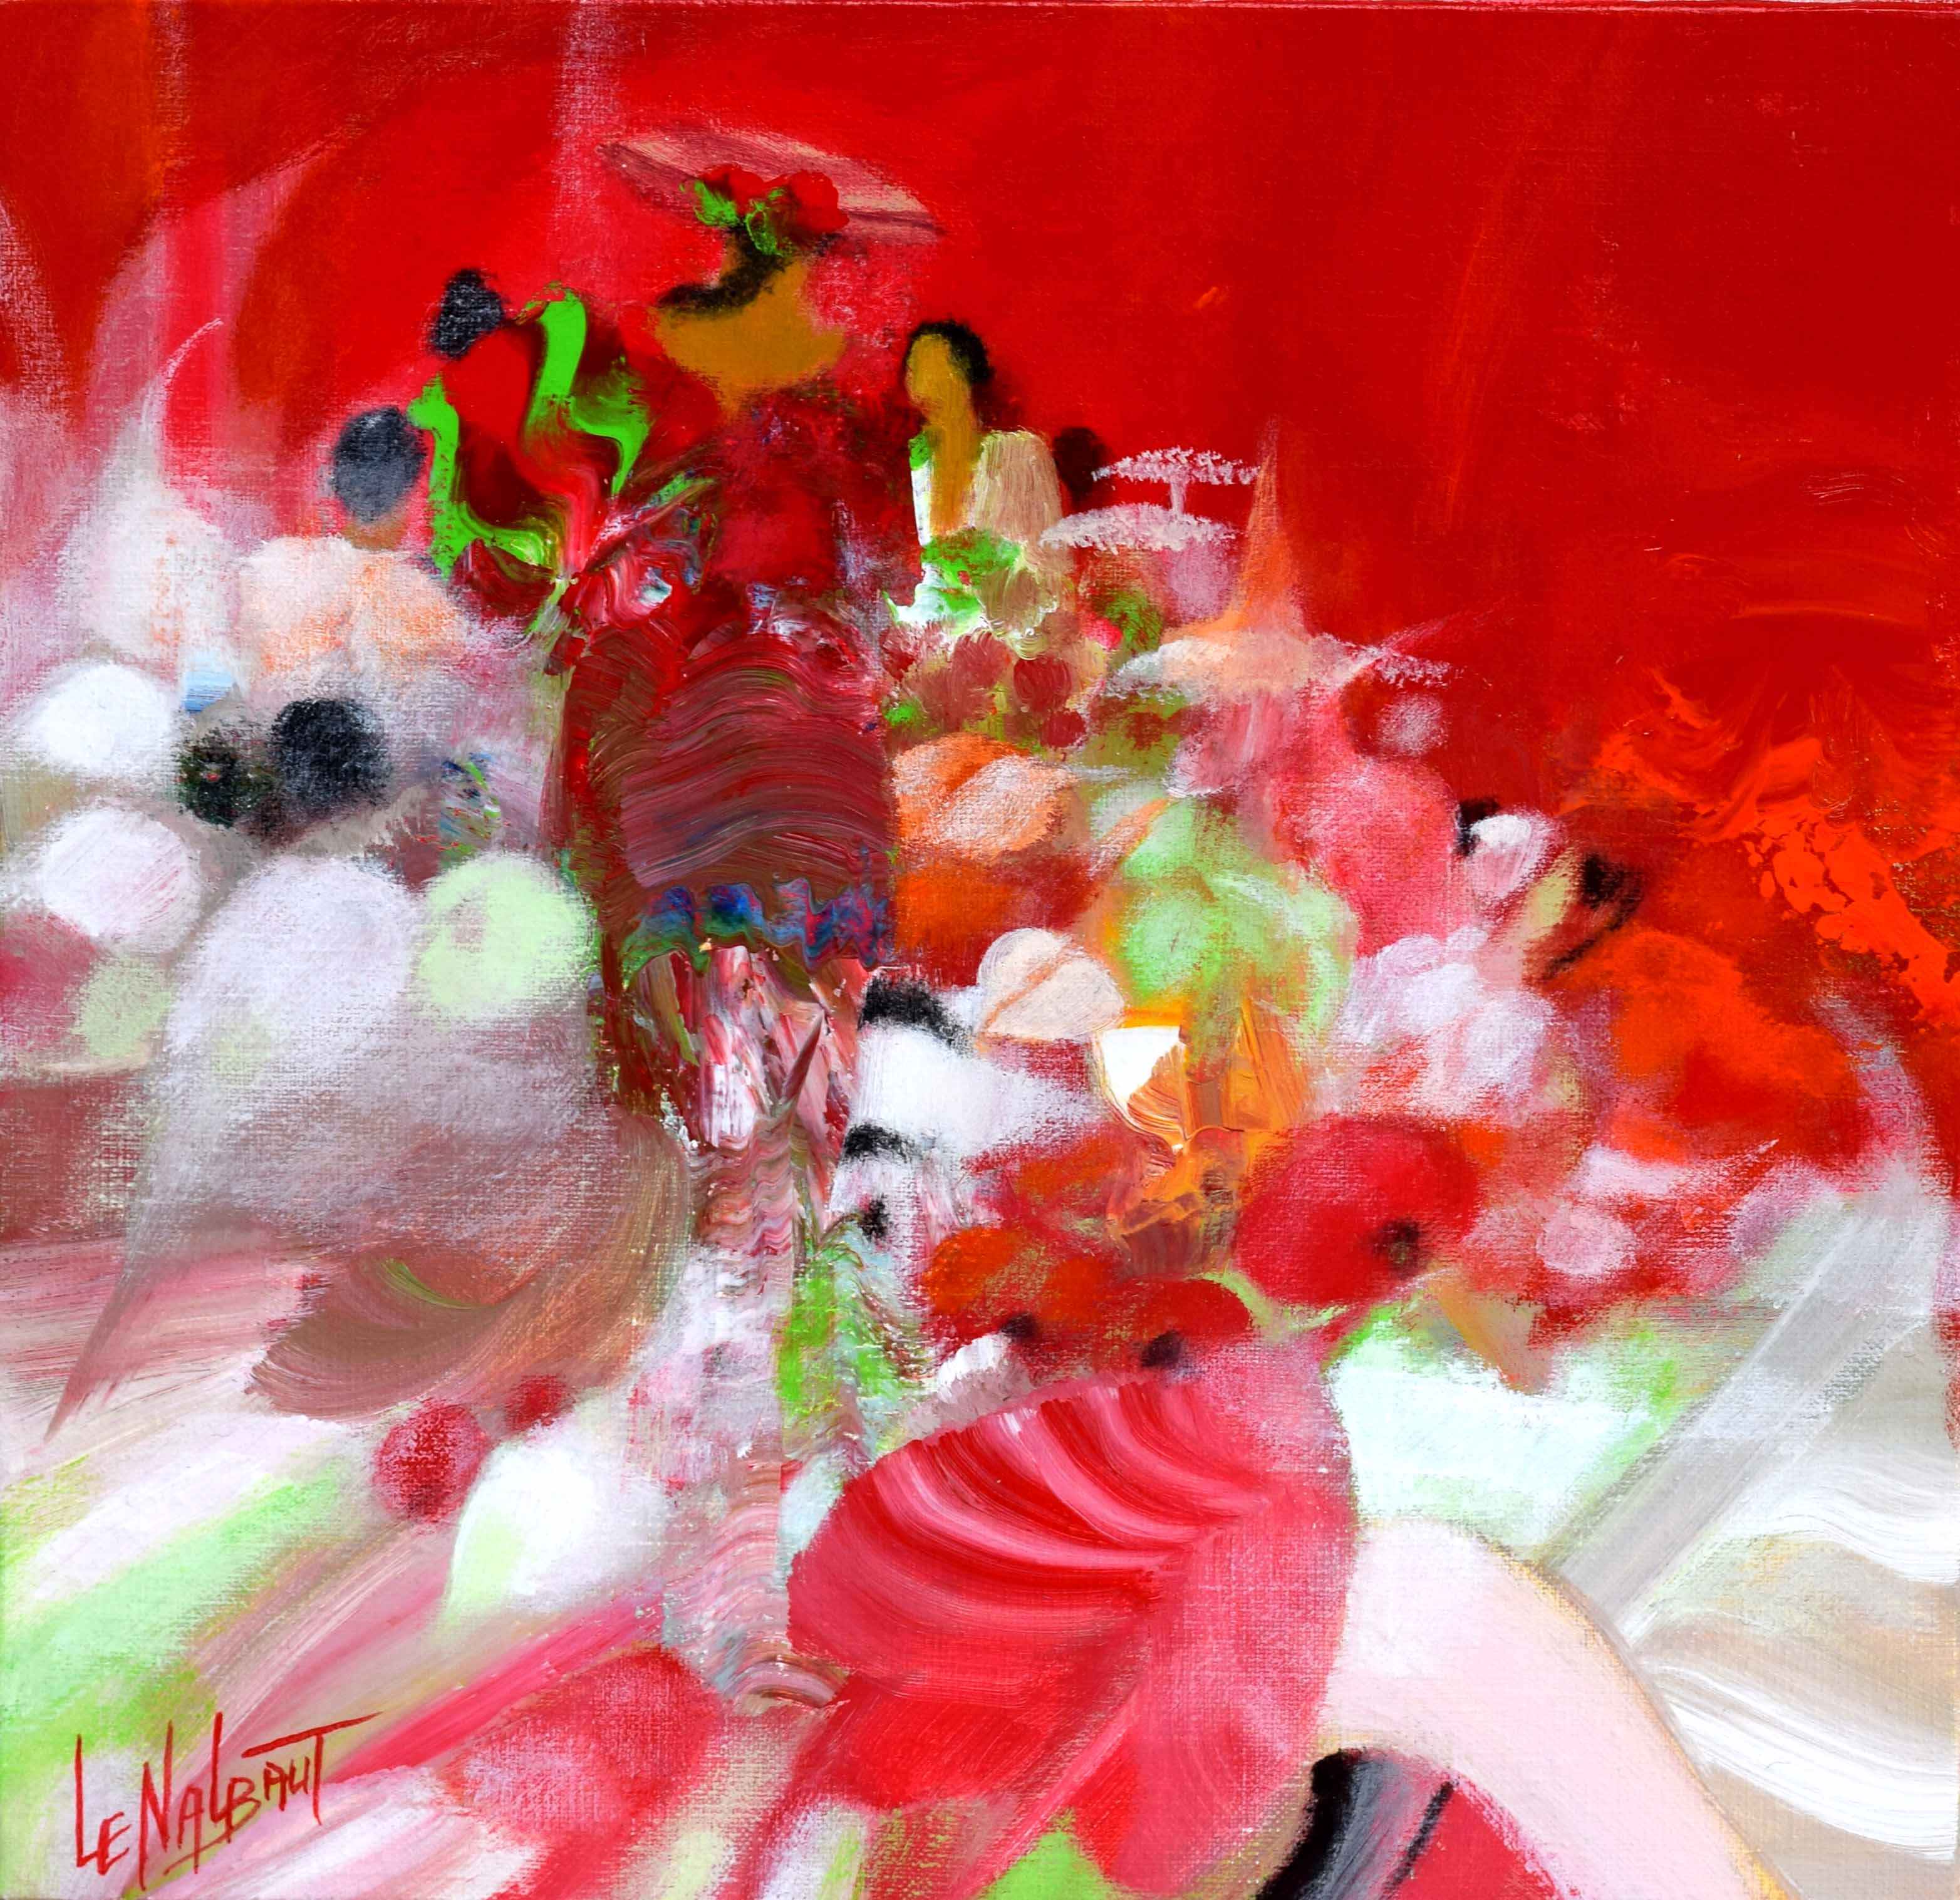 https://www.galerie-saint-martin.com/artistes/le-nalbaut/